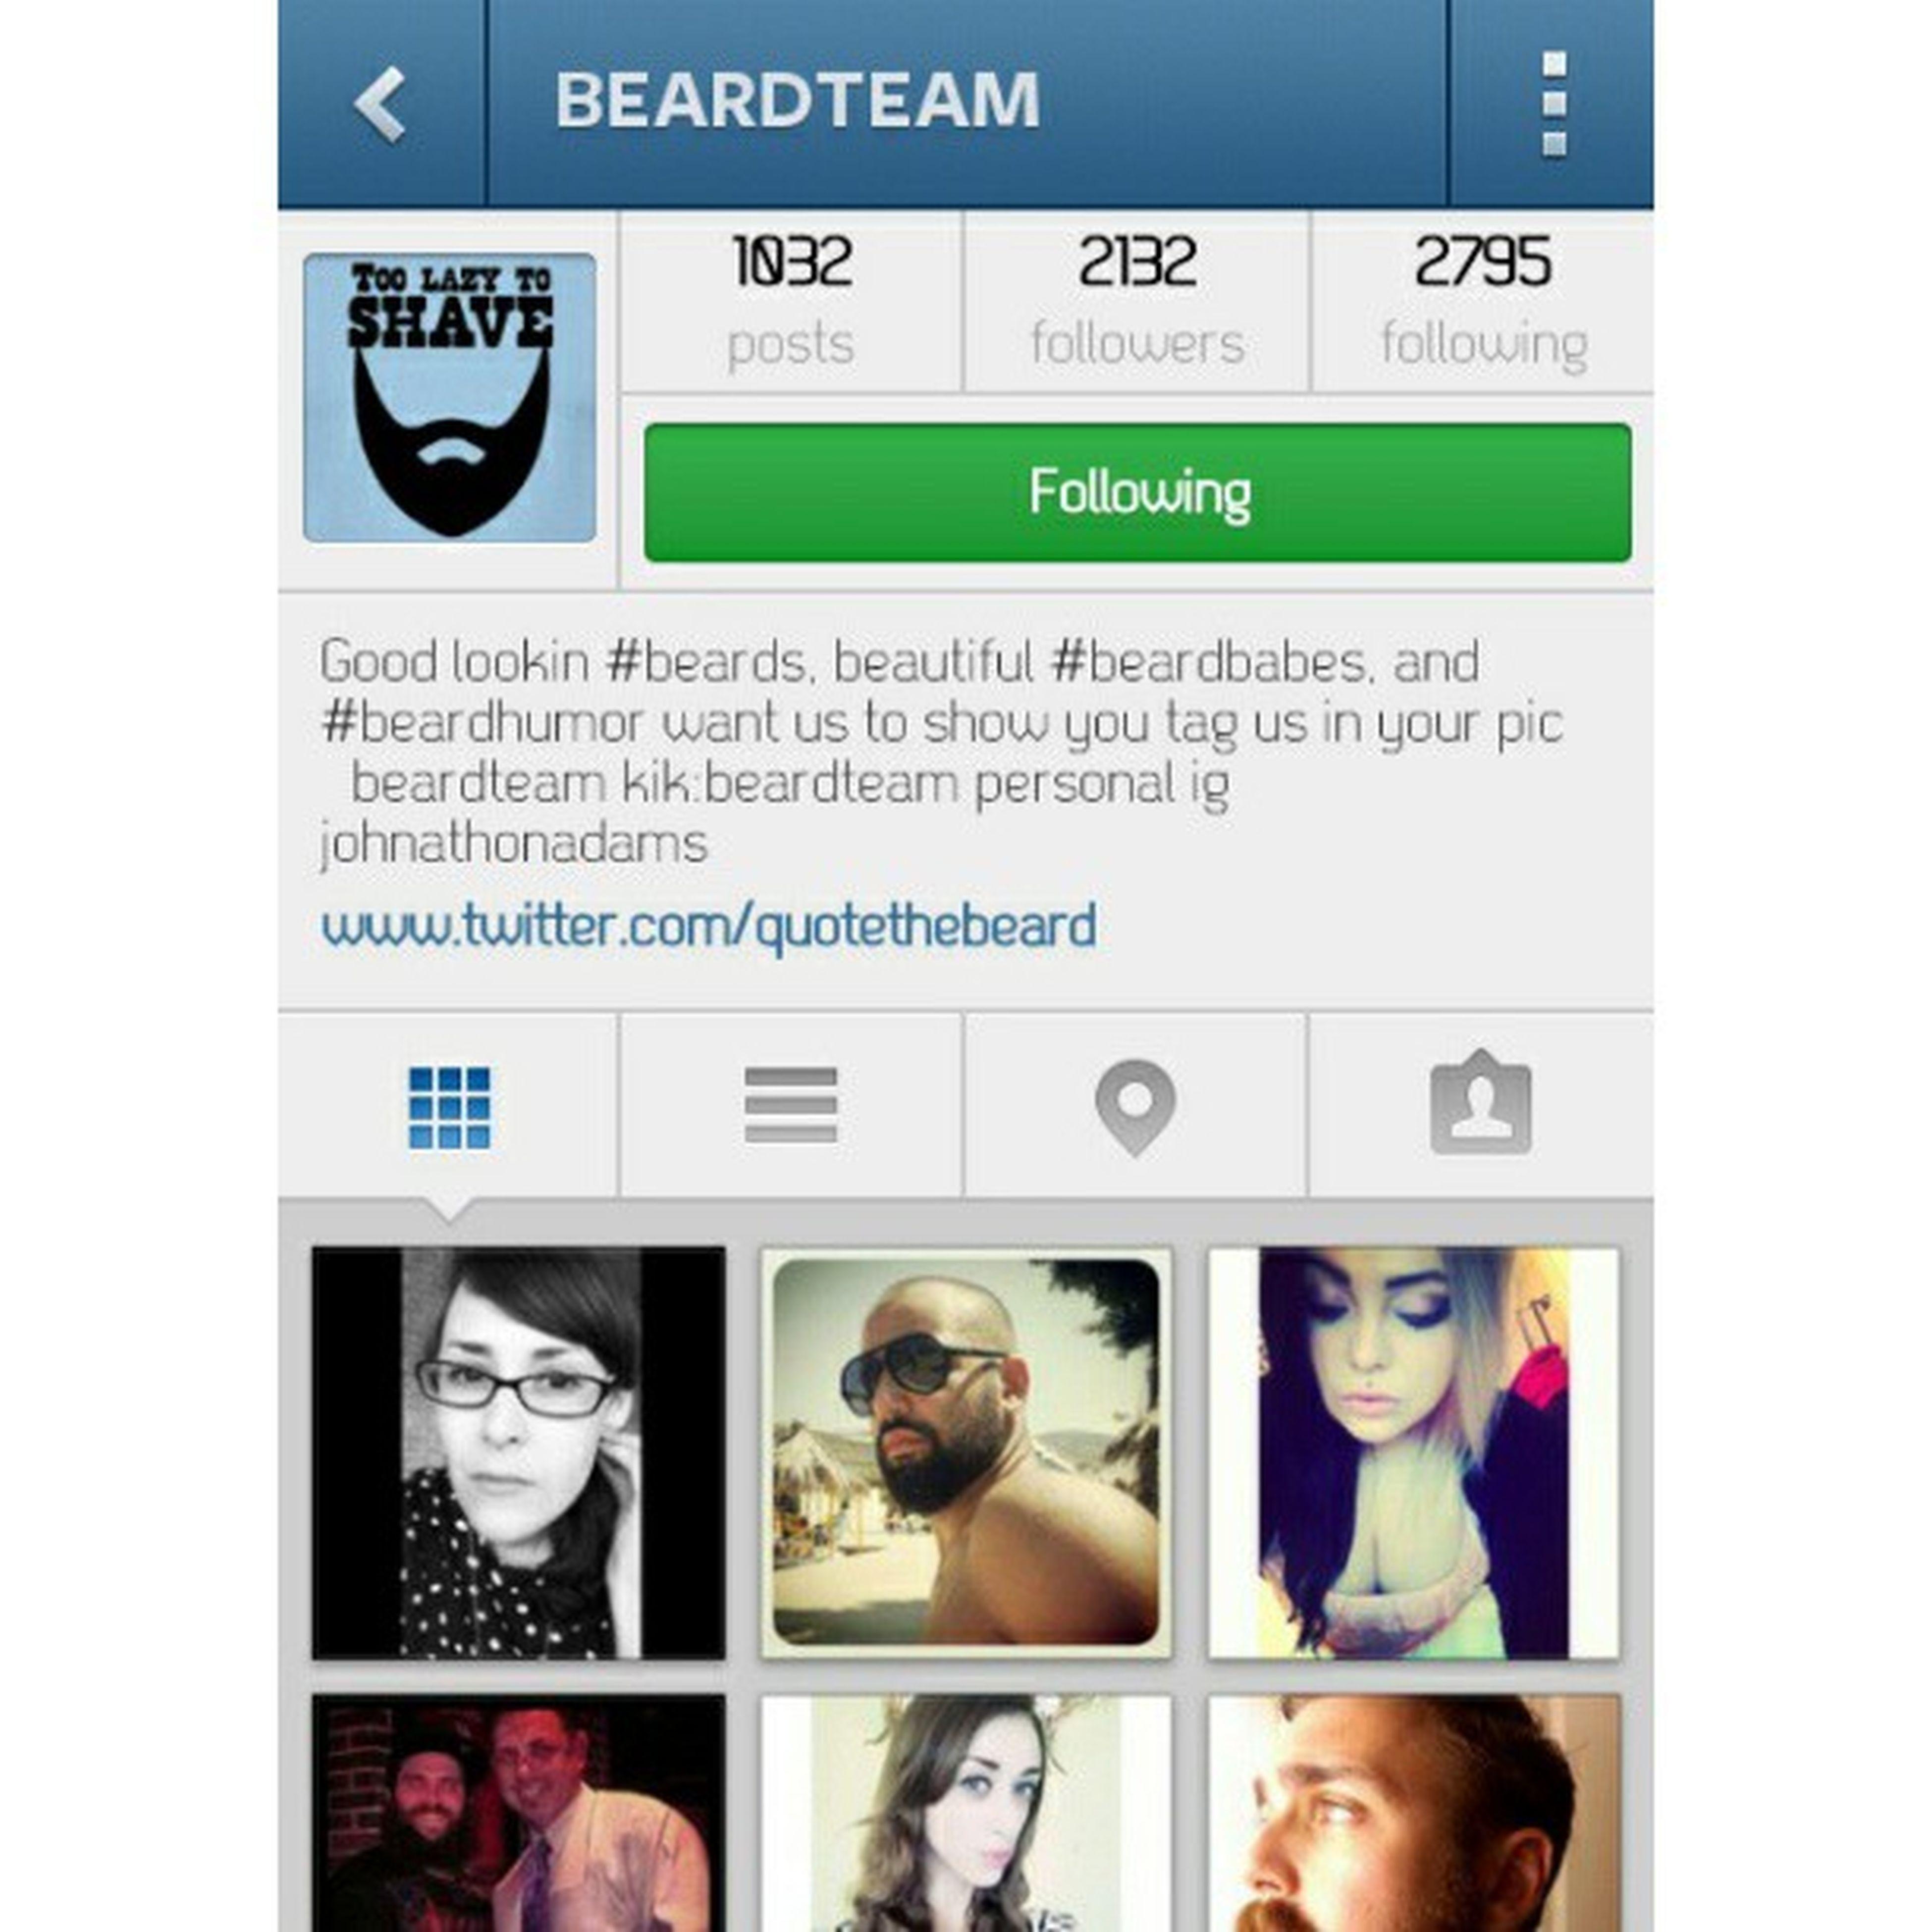 I got featured in the @beardteam page. Useful beard ;).......double tap and follow this page @beardteam @beardteam Beardbrother Beardbabes Famous S4S snapchat like4like picoftheday